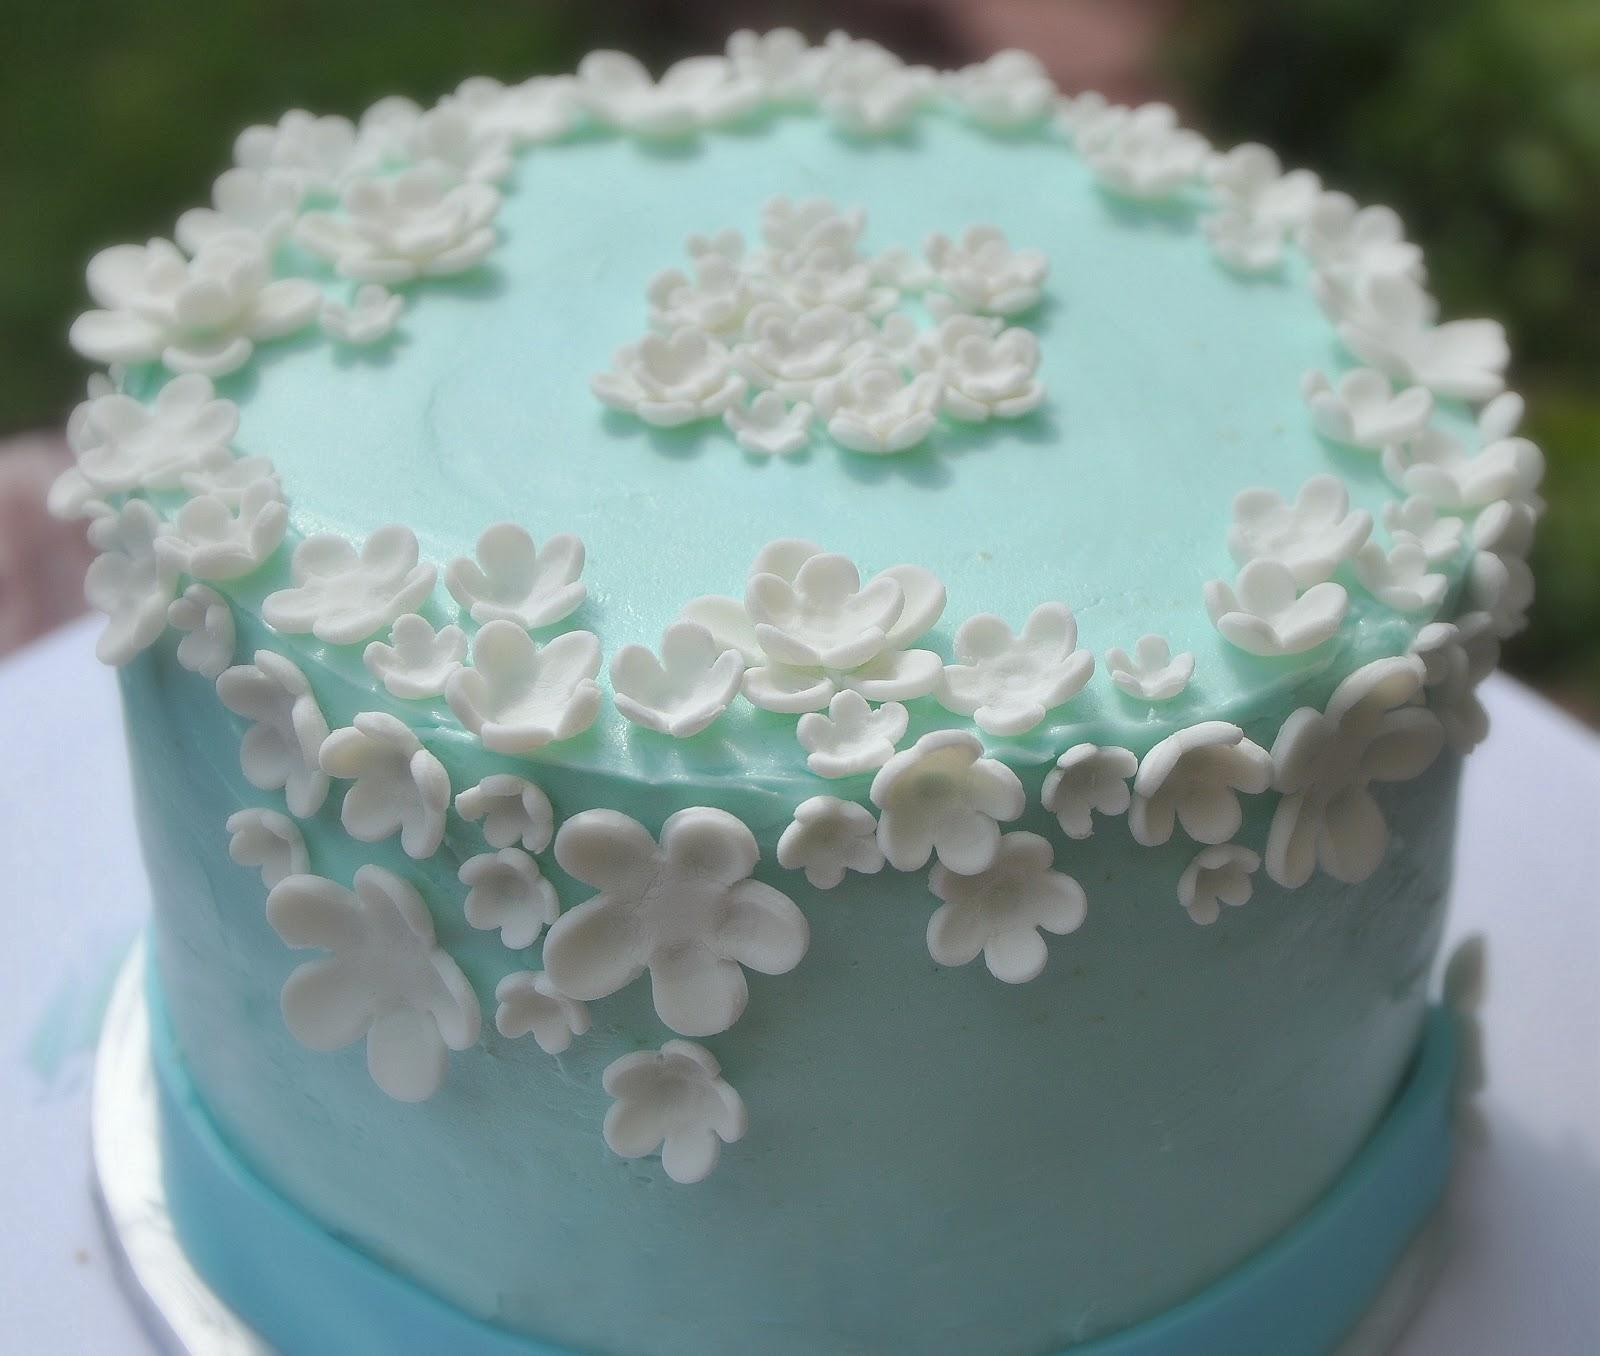 Flowers birthday cakes turtlecraftygirl flower birthday cake izmirmasajfo